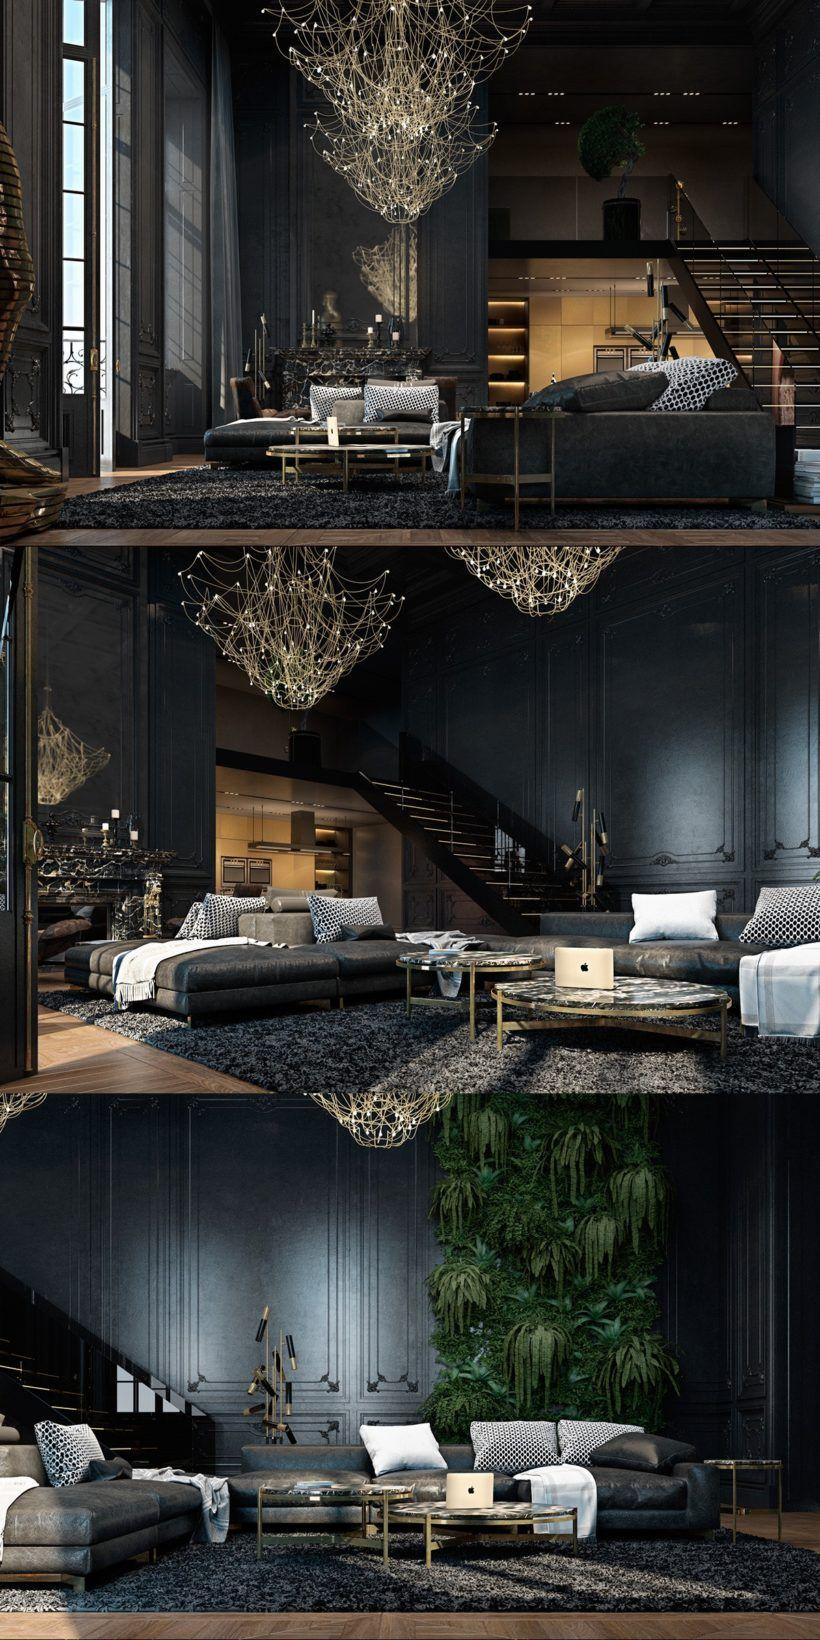 home lighting ideas also my dream will have interior rh pinterest